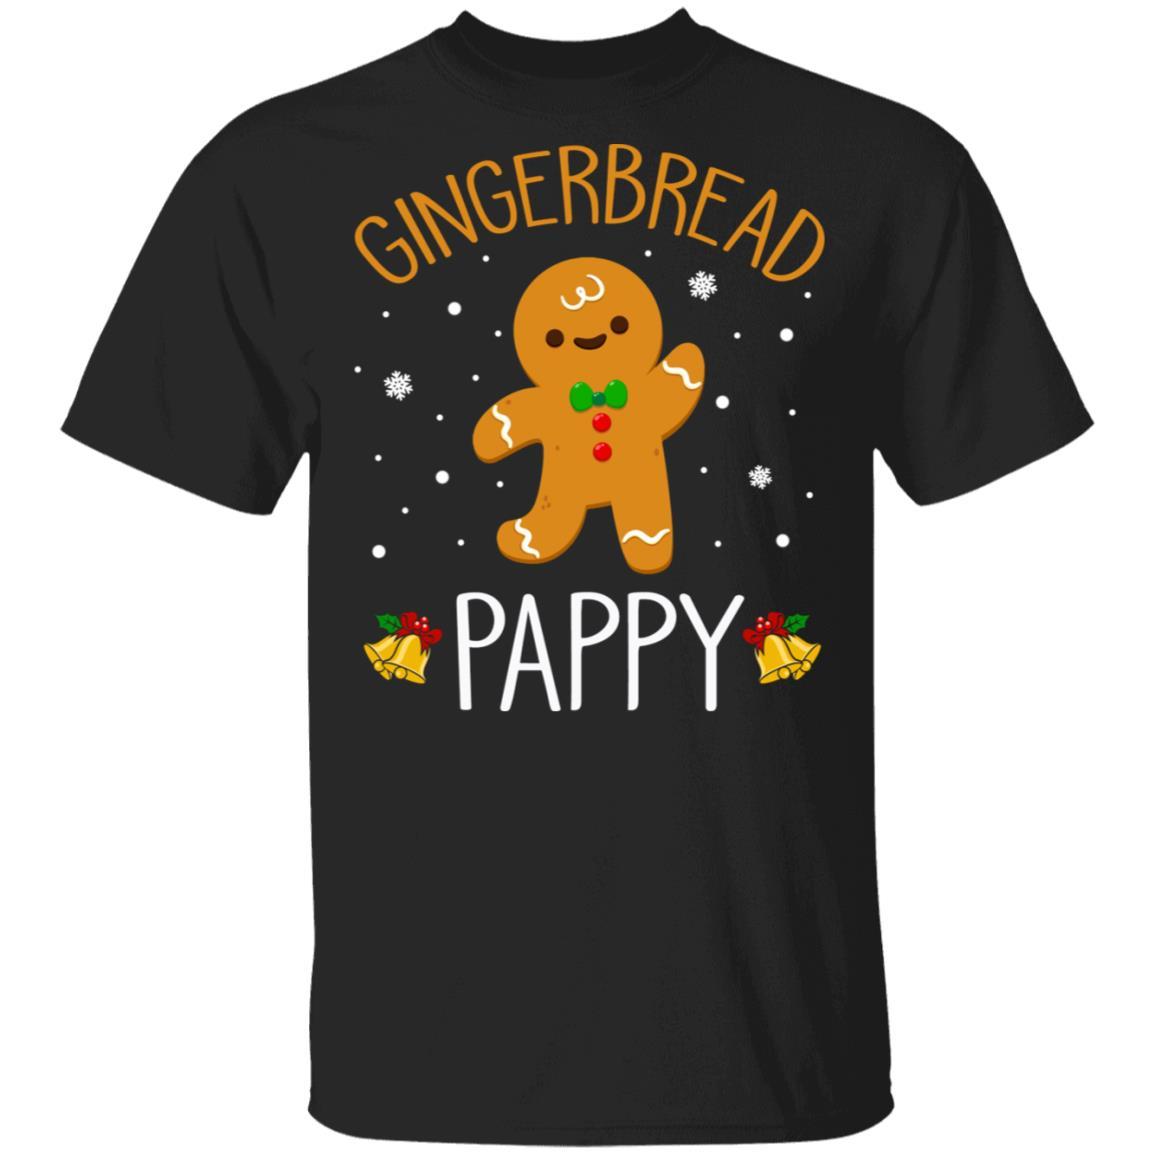 Xmas Cute Gingerbread Men Pappy Christmas Family Unisex Short Sleeve